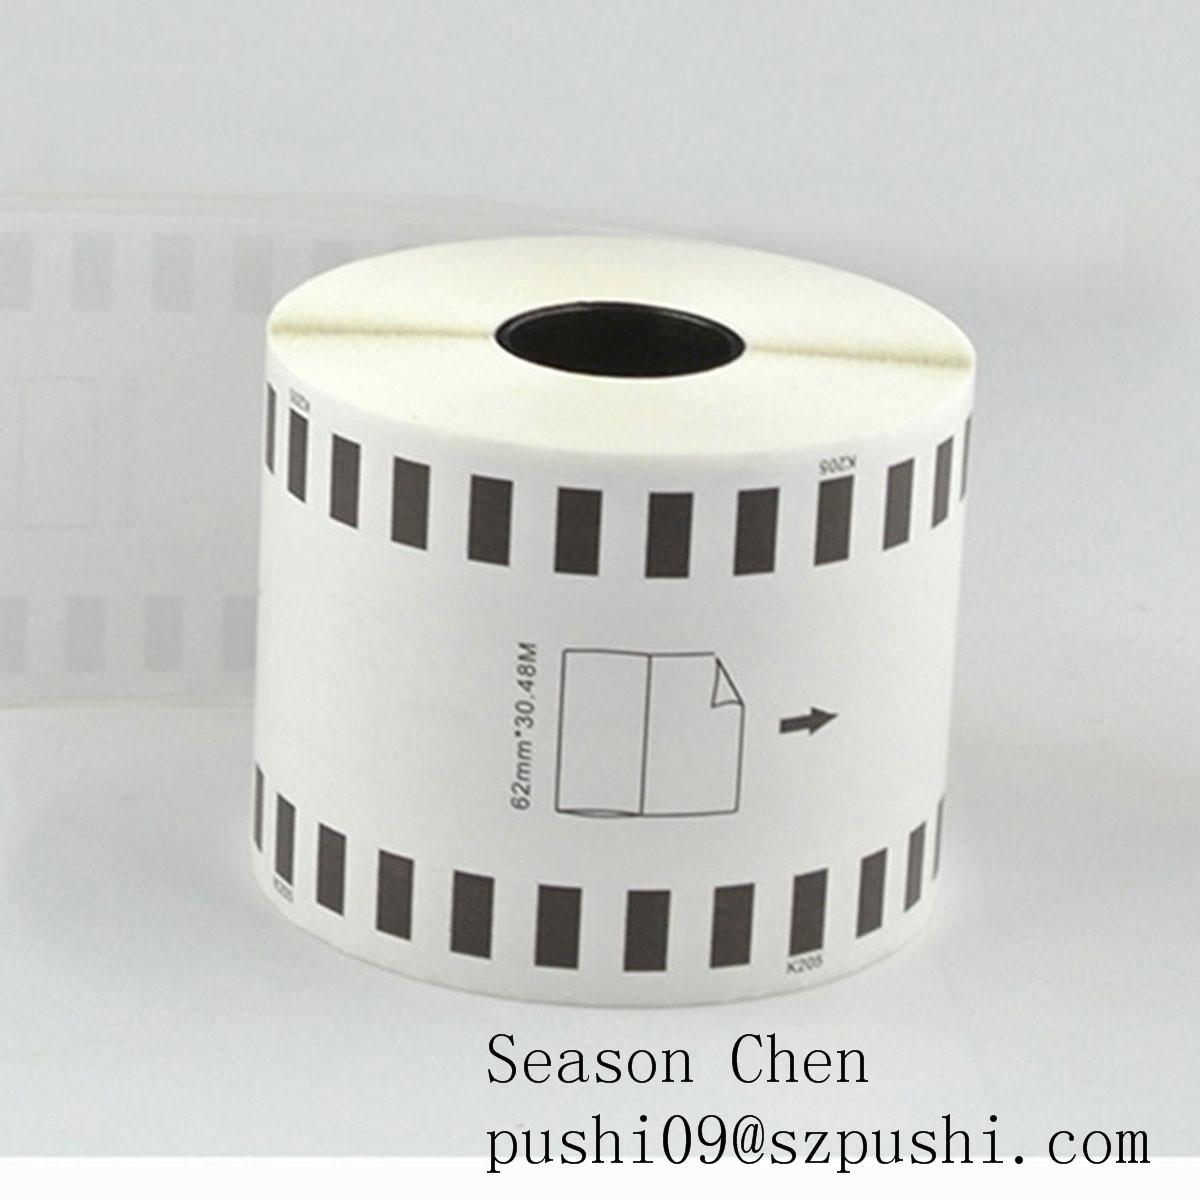 DK sticker label DK-22205 DK2205 DK 22205 for thermic printer brother ql700